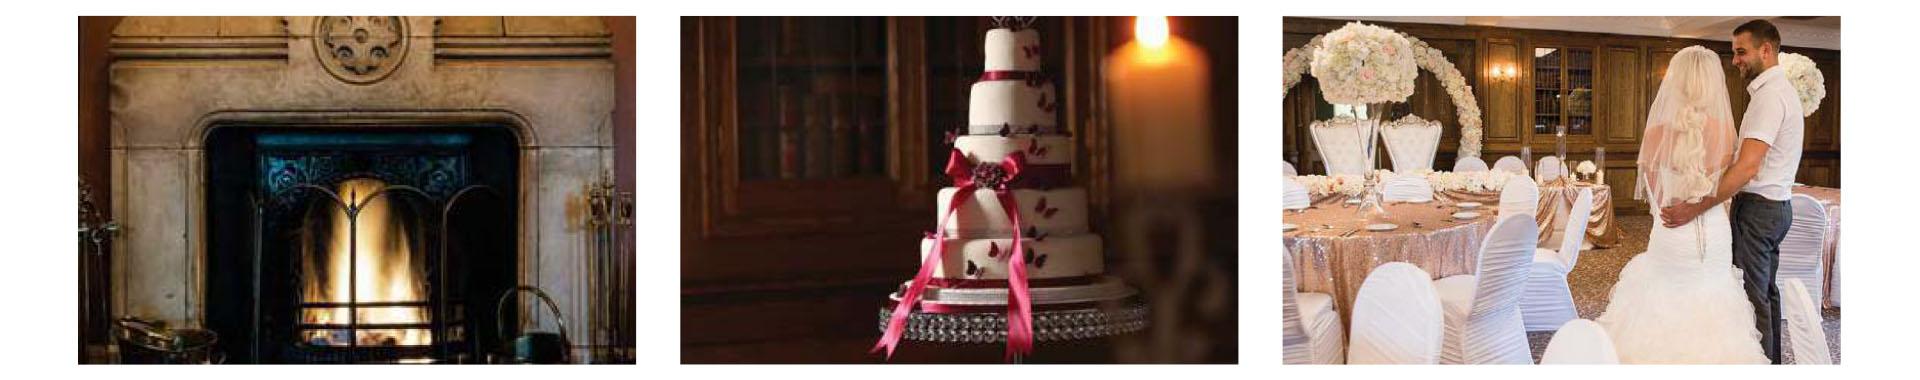 Evening Only Wedding Reception Package at Weddings Bredbury Hall Wedding Venue in Stockport Cheshire.jpg